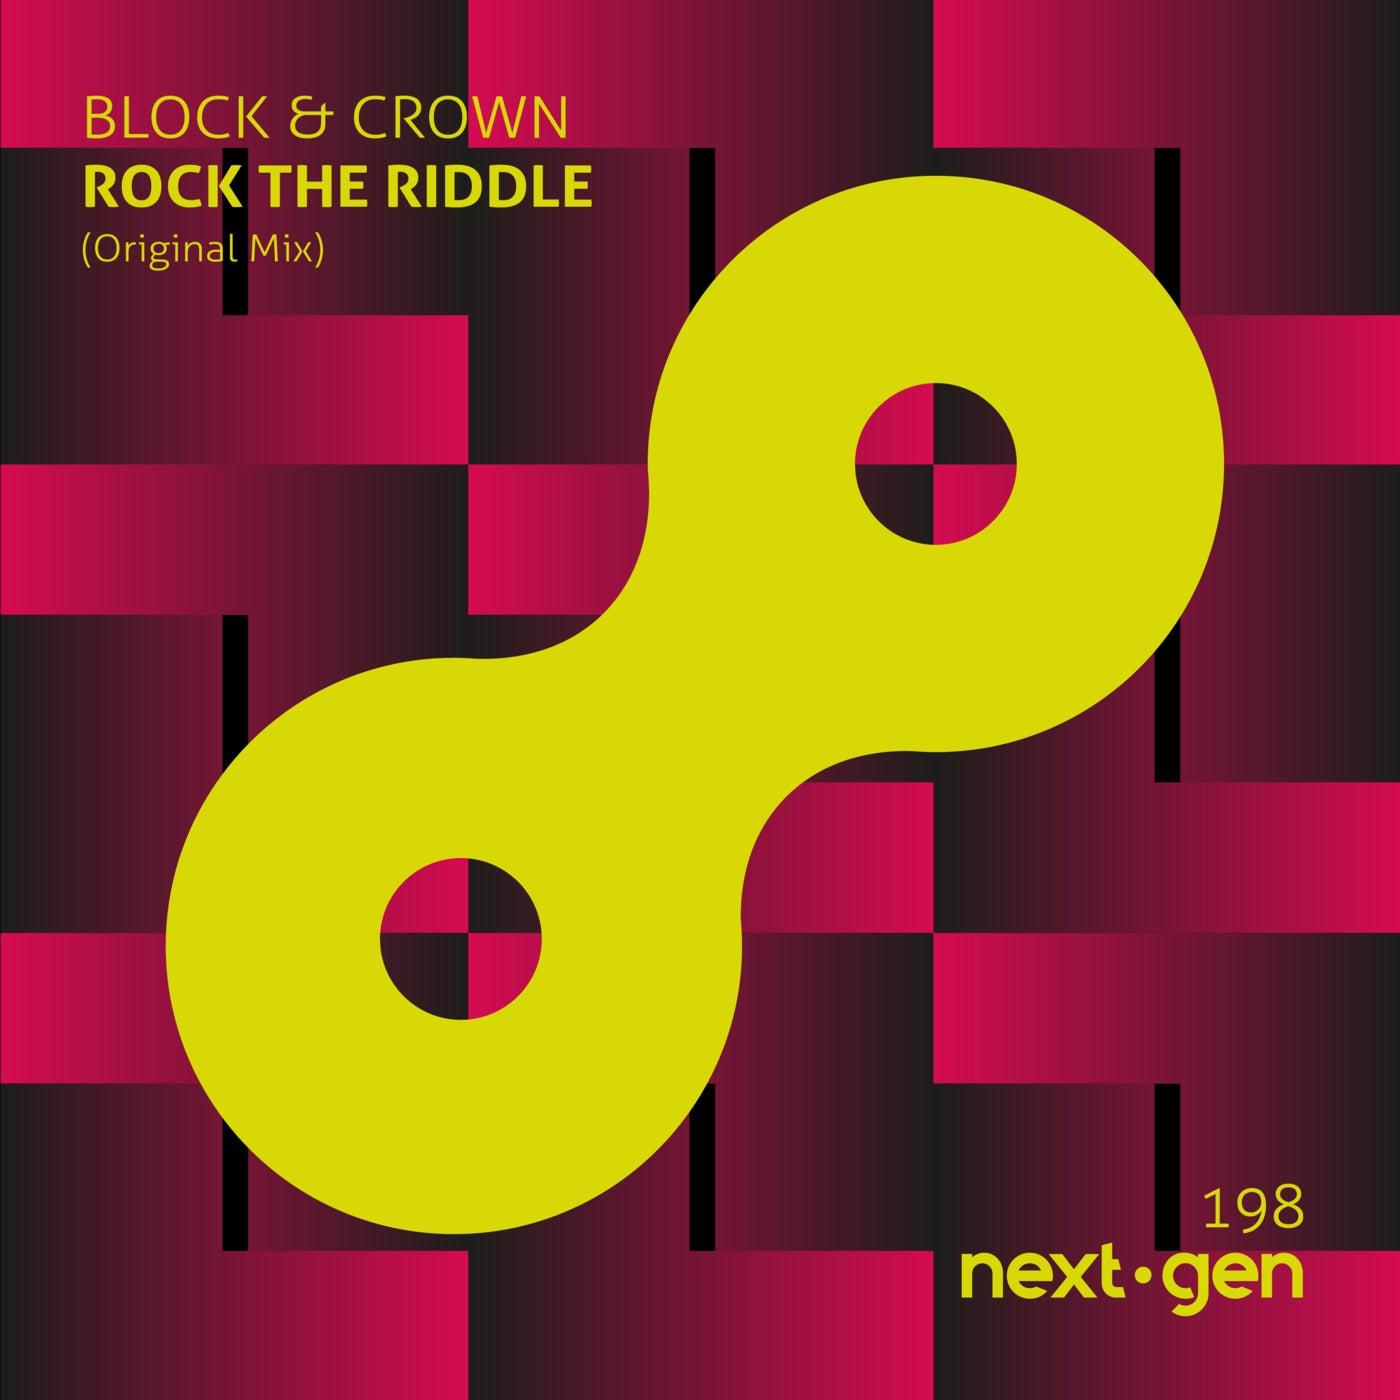 Rock The Riddle (Original Mix)